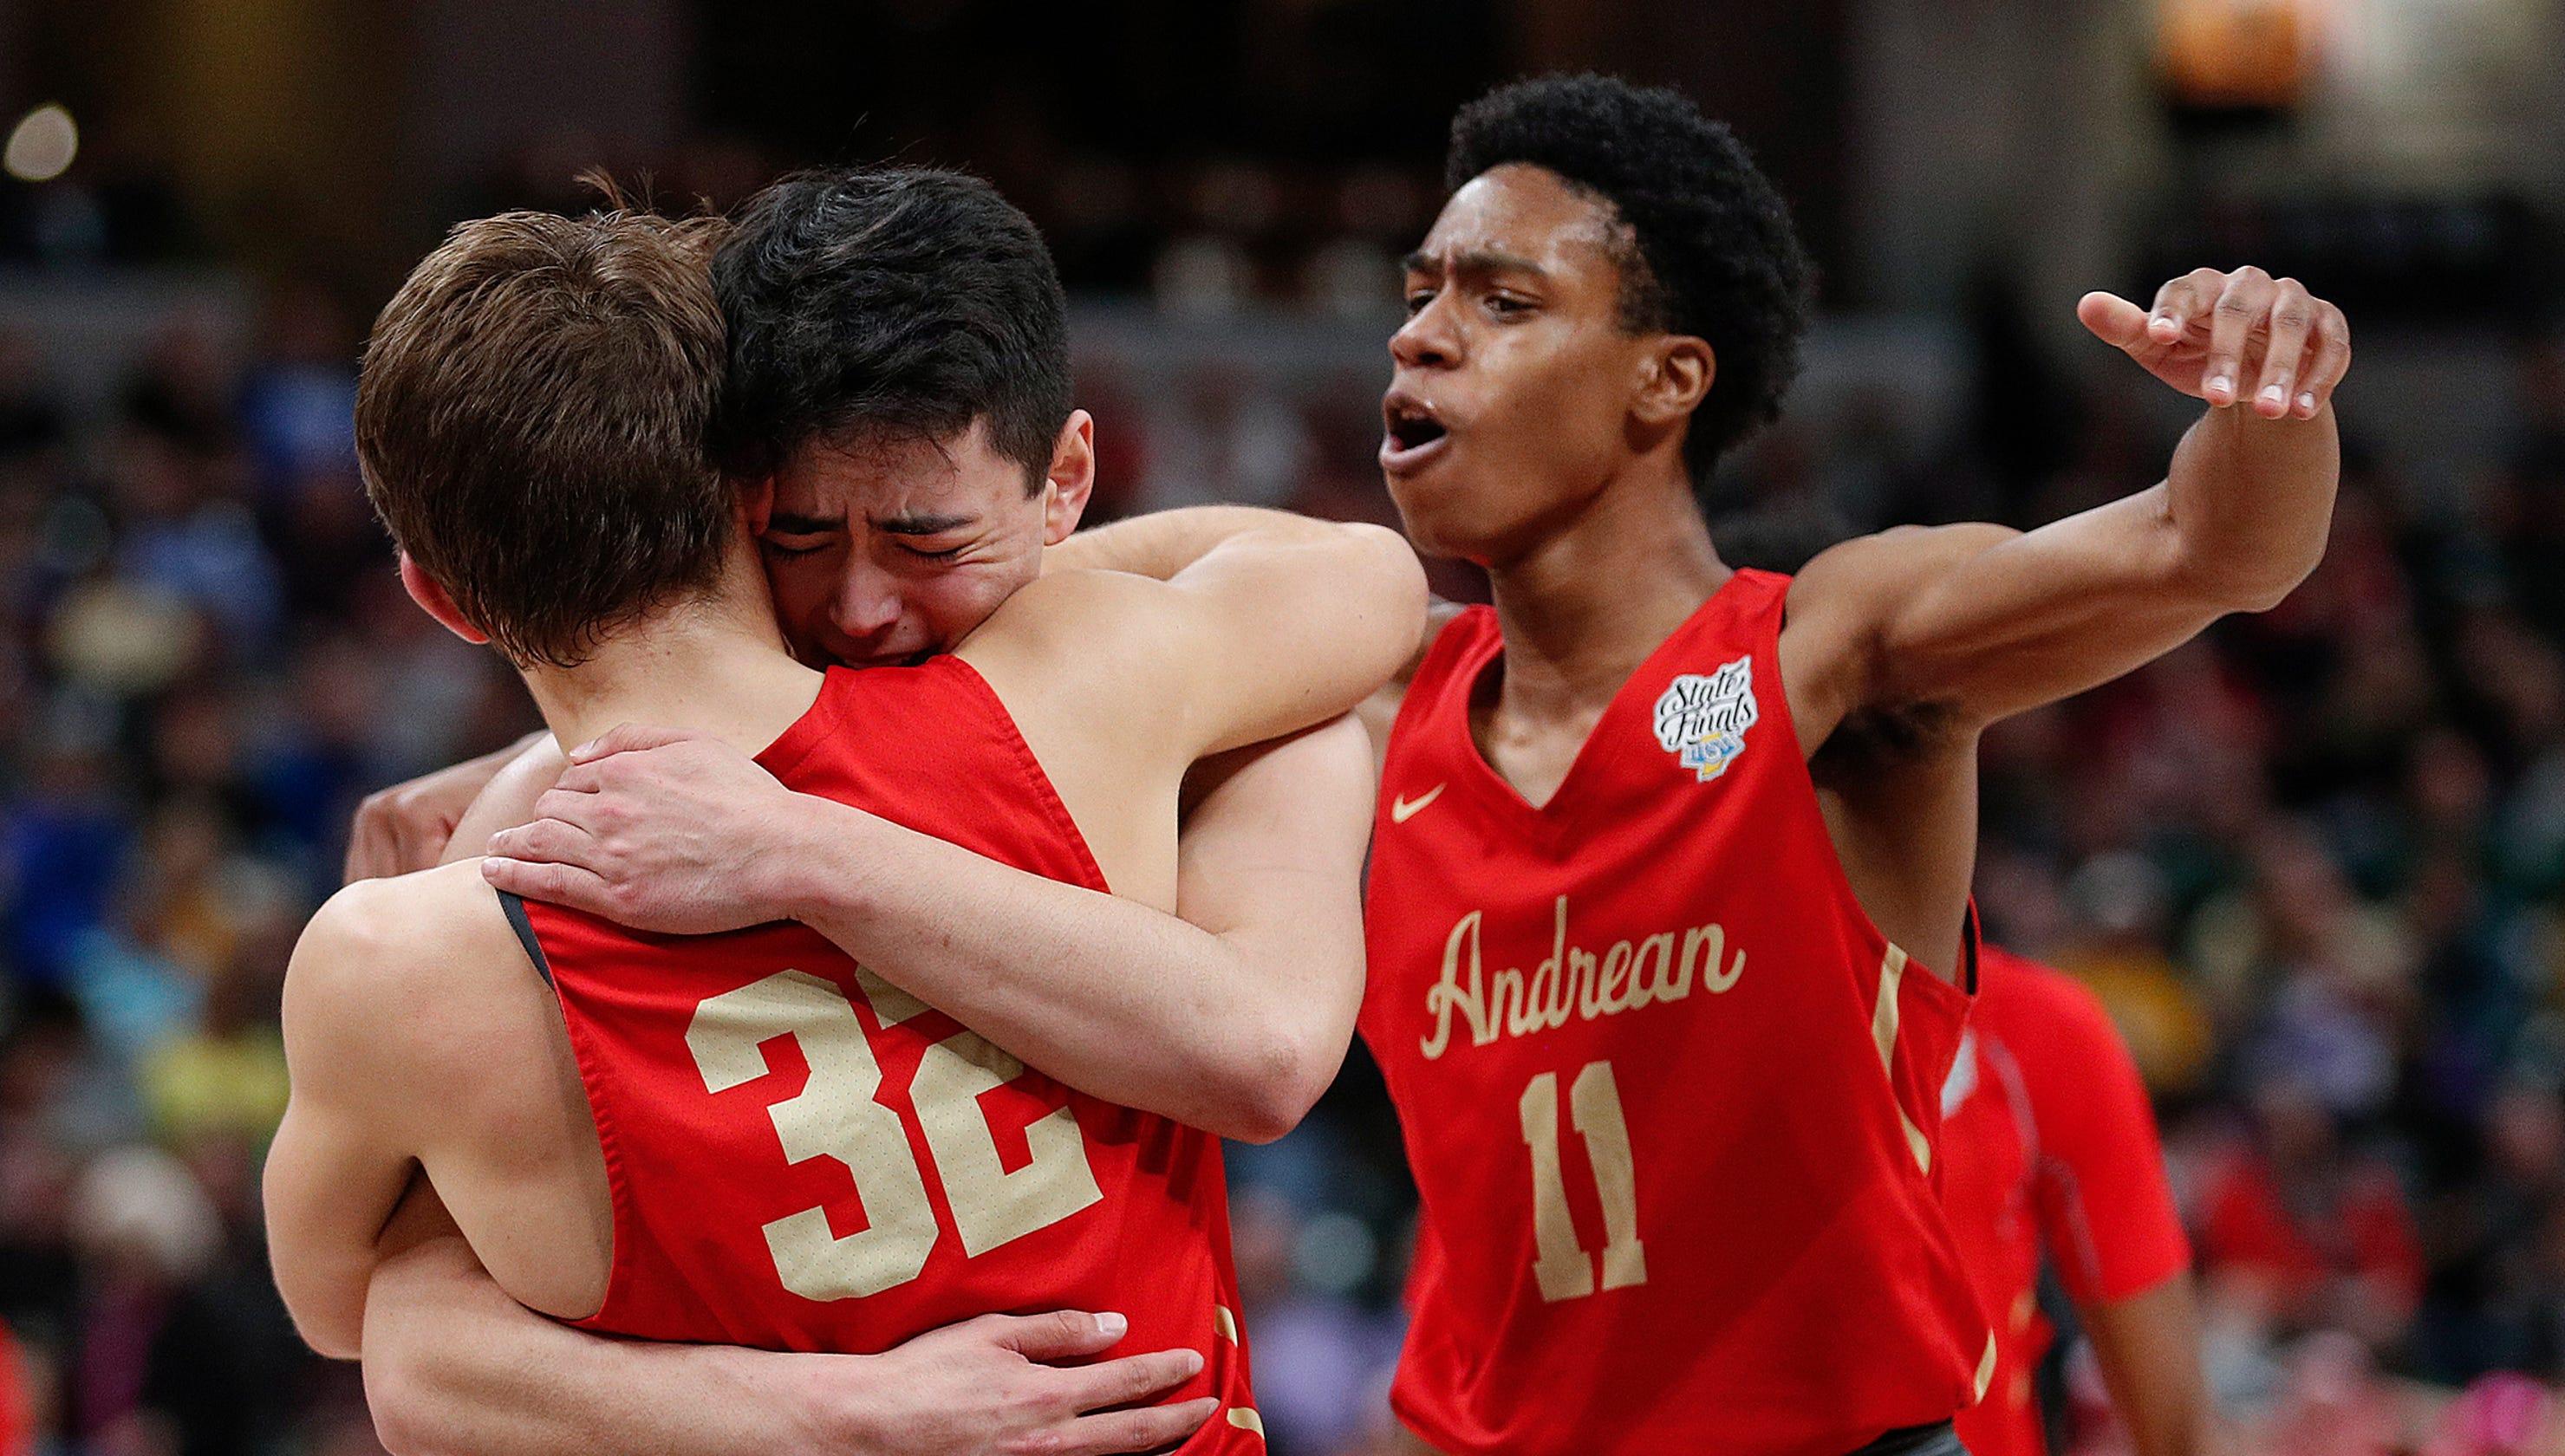 Indiana HS Basketball: Andrean Beats Linton-Stockton For